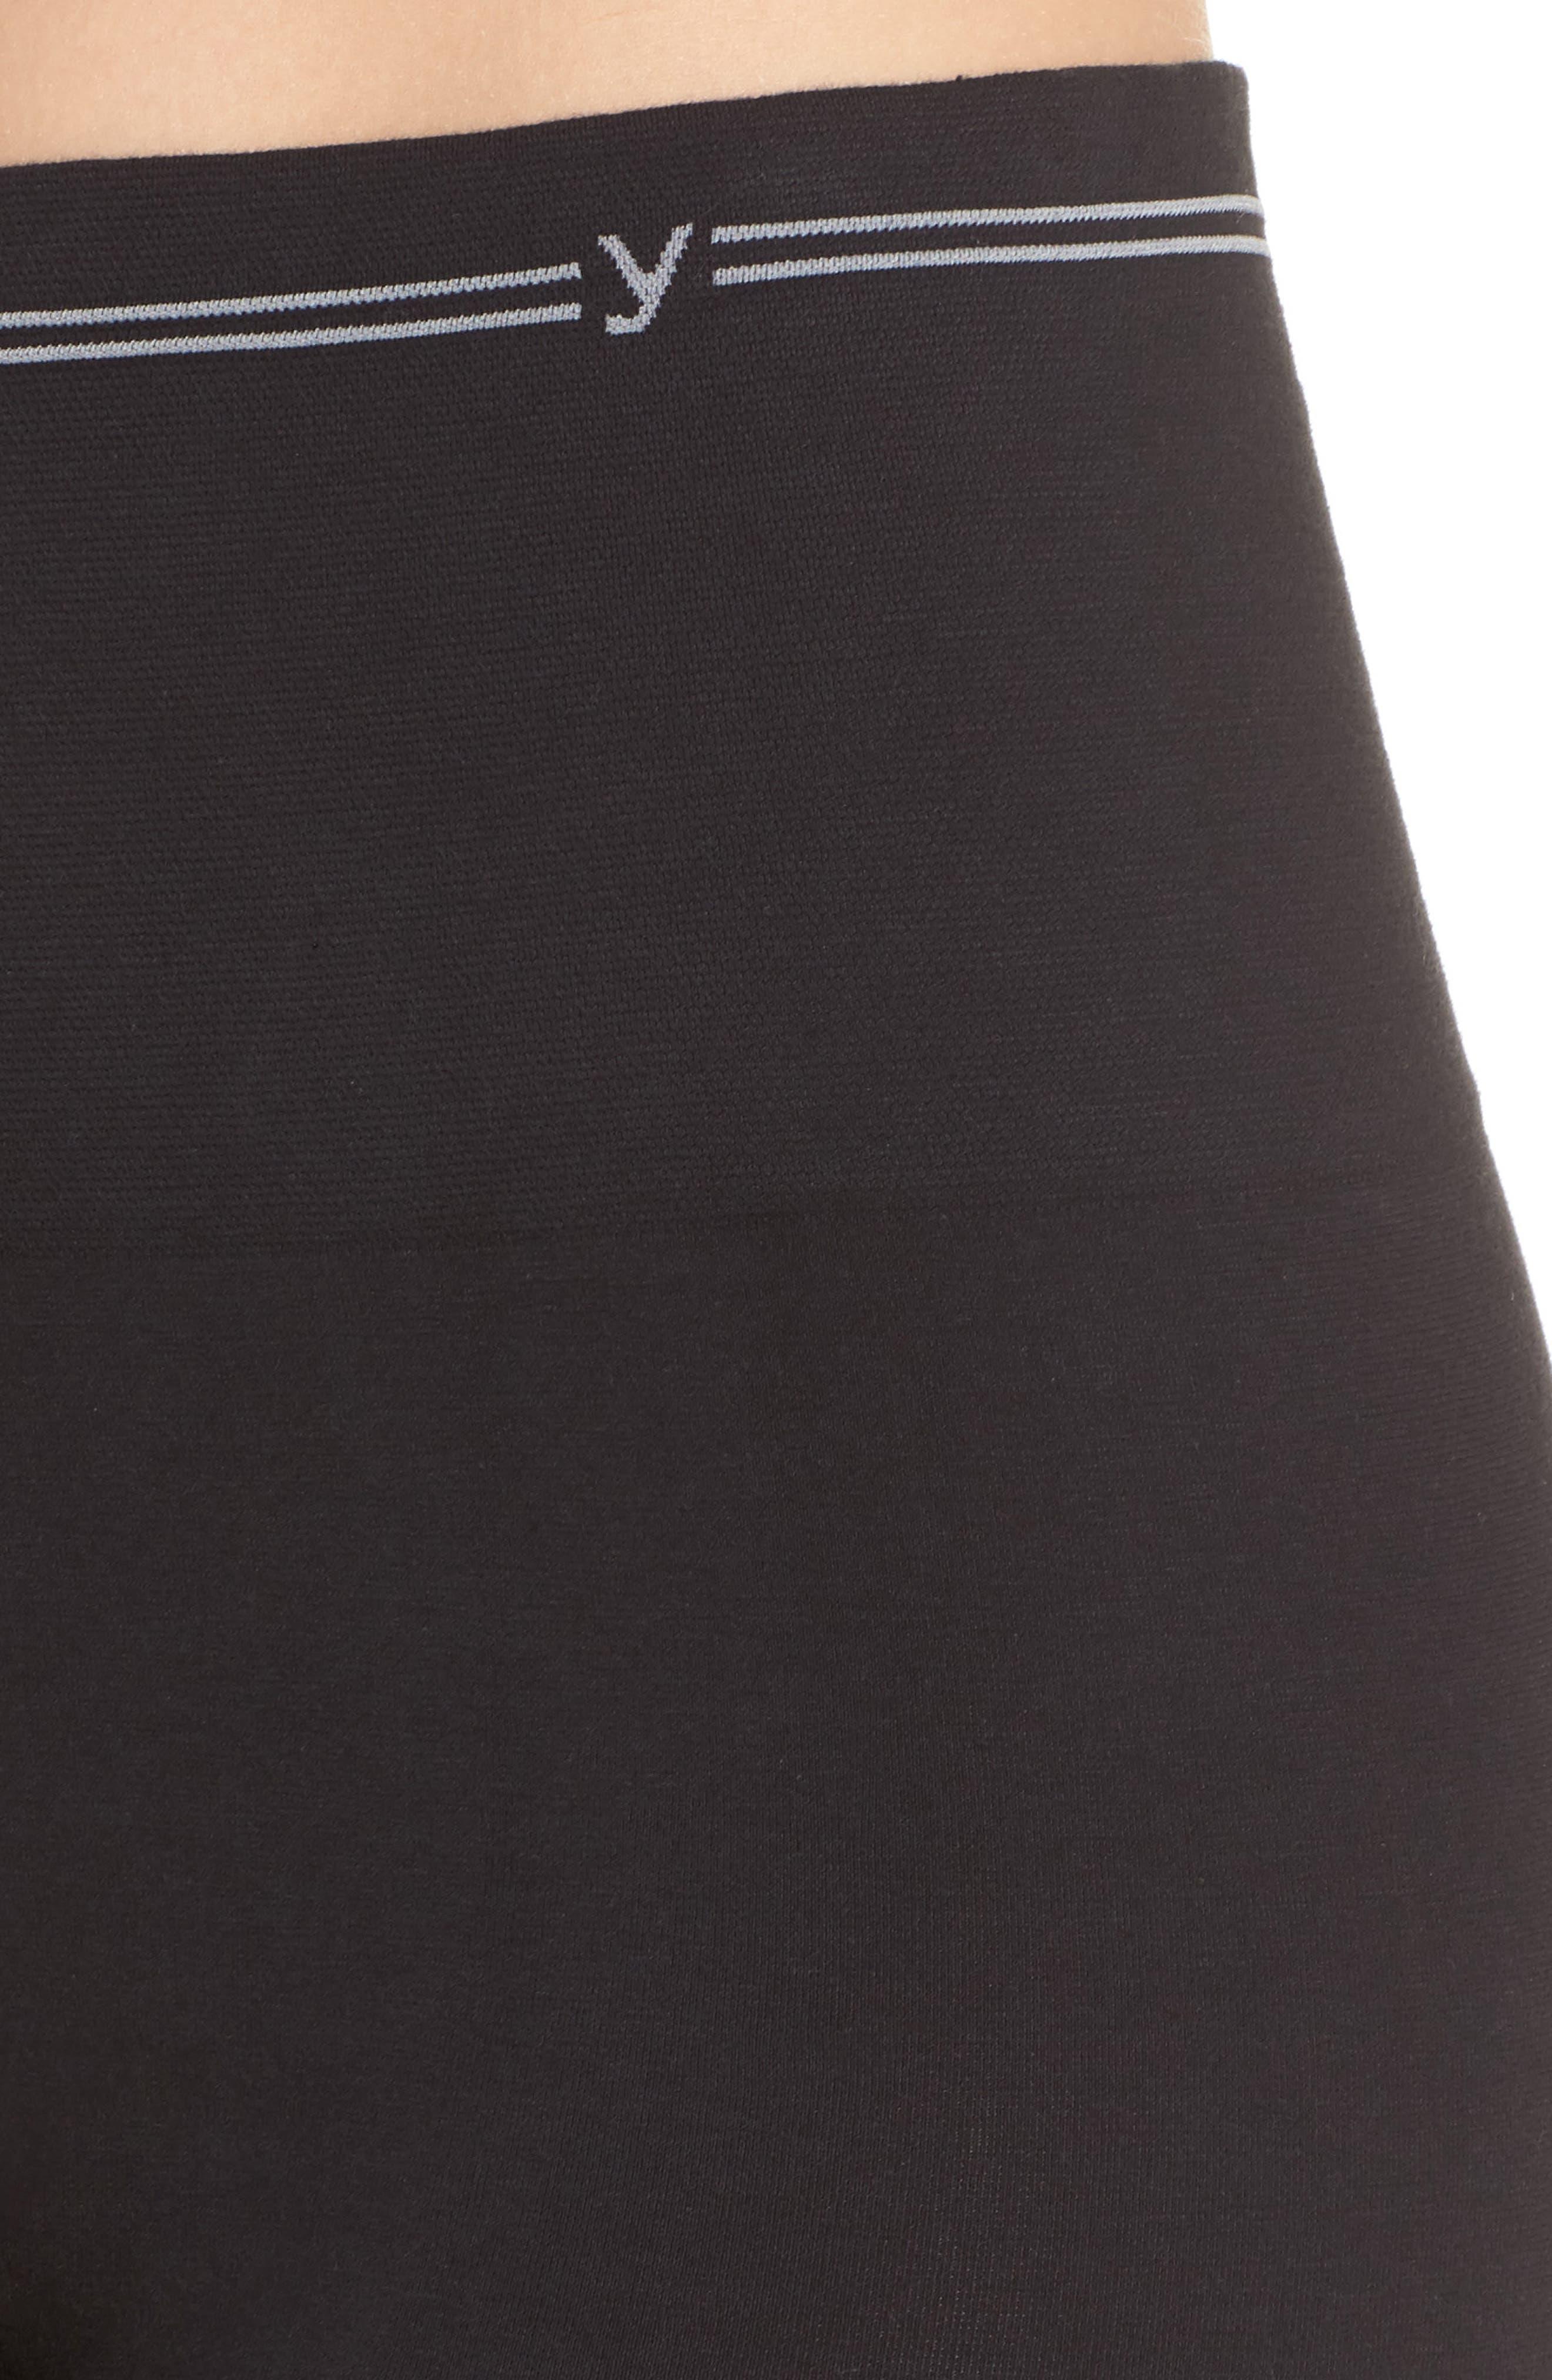 Seamless Shaping Shorts,                             Alternate thumbnail 4, color,                             001